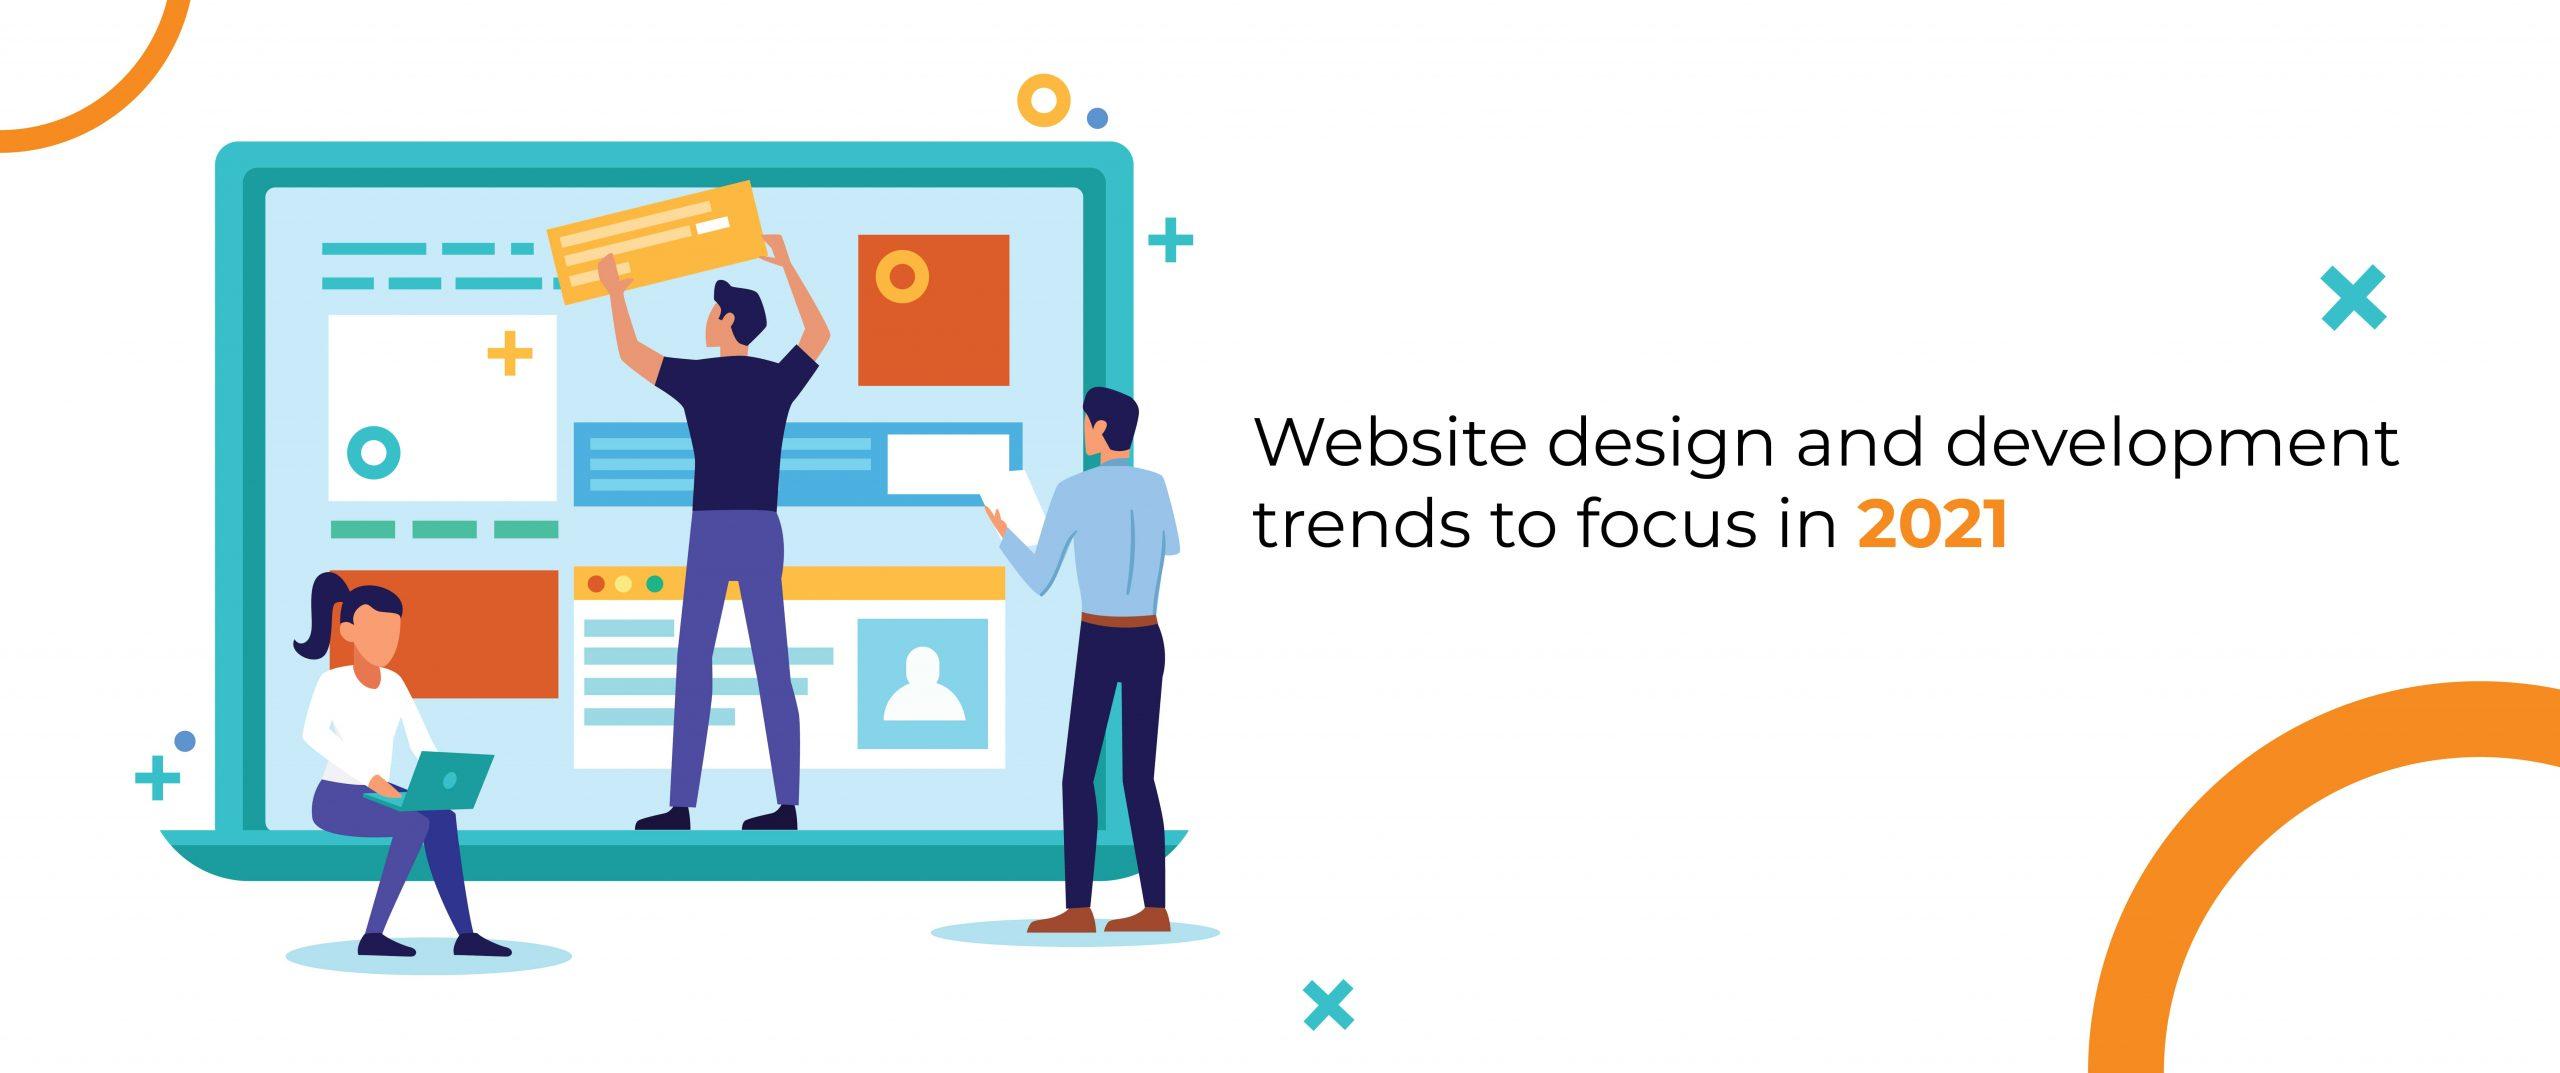 Website design and development trends 2021